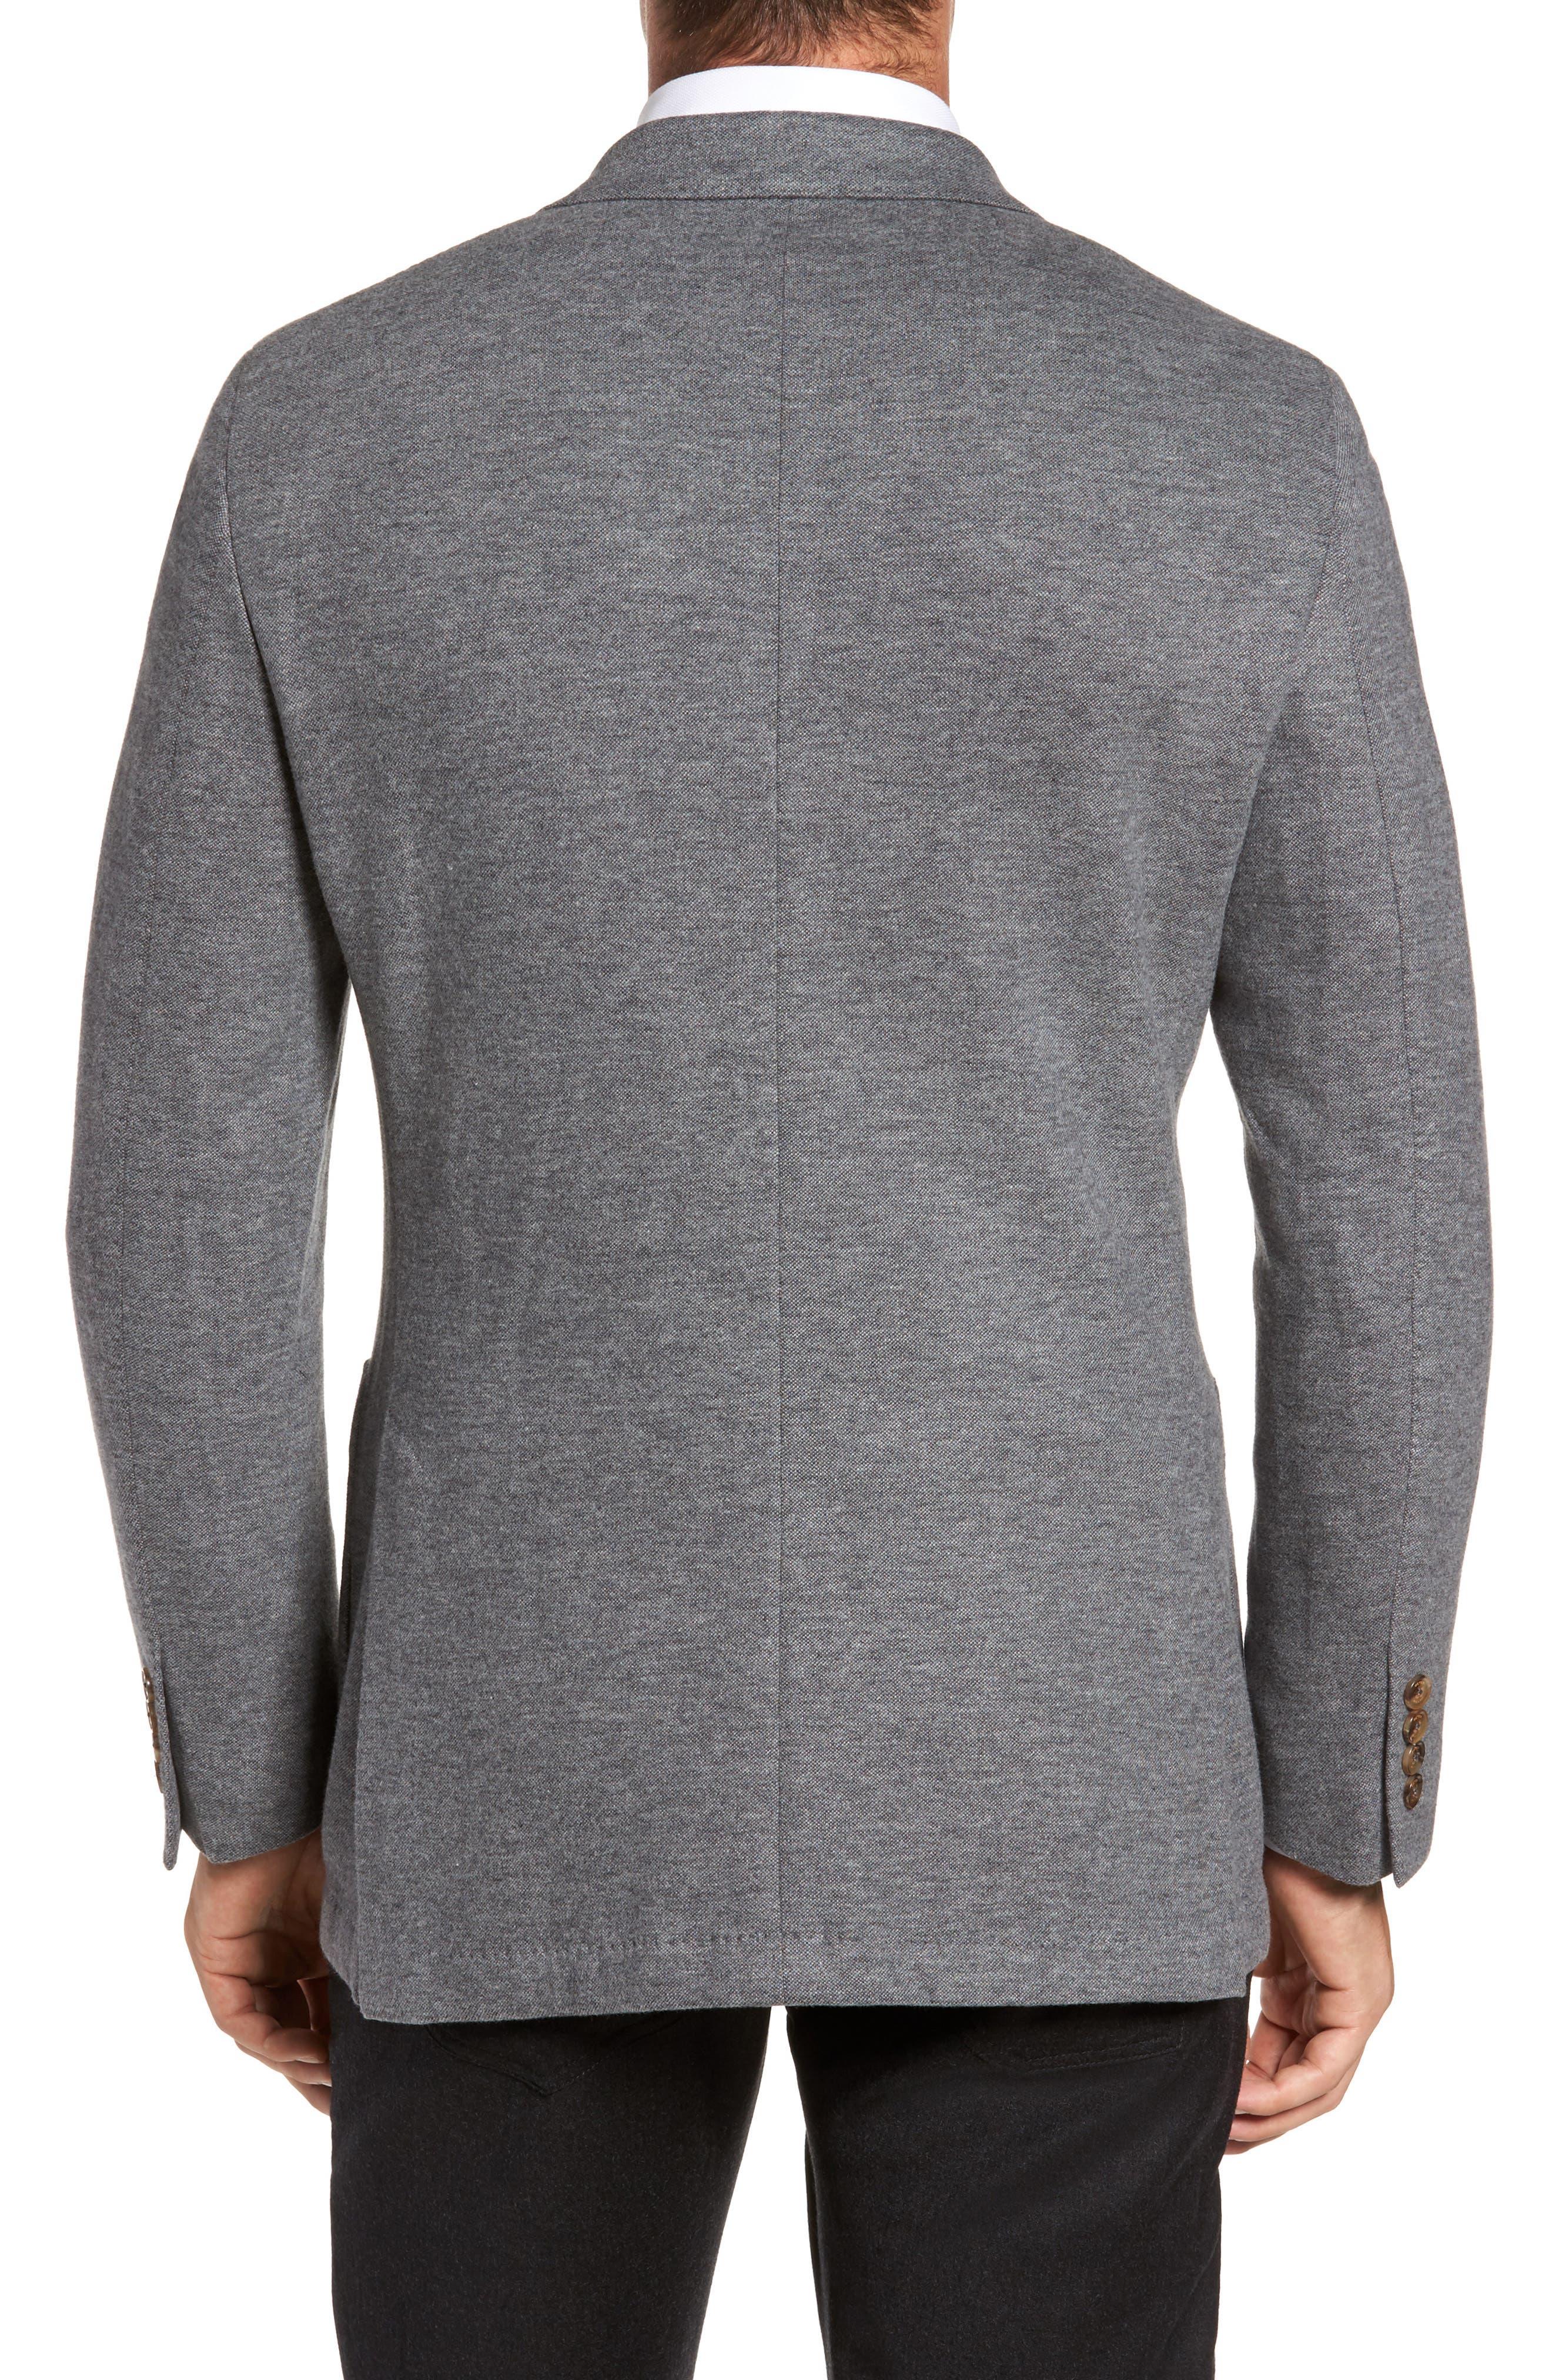 Alternate Image 2  - Peter Millar Sierran Jersey Knit Jacket